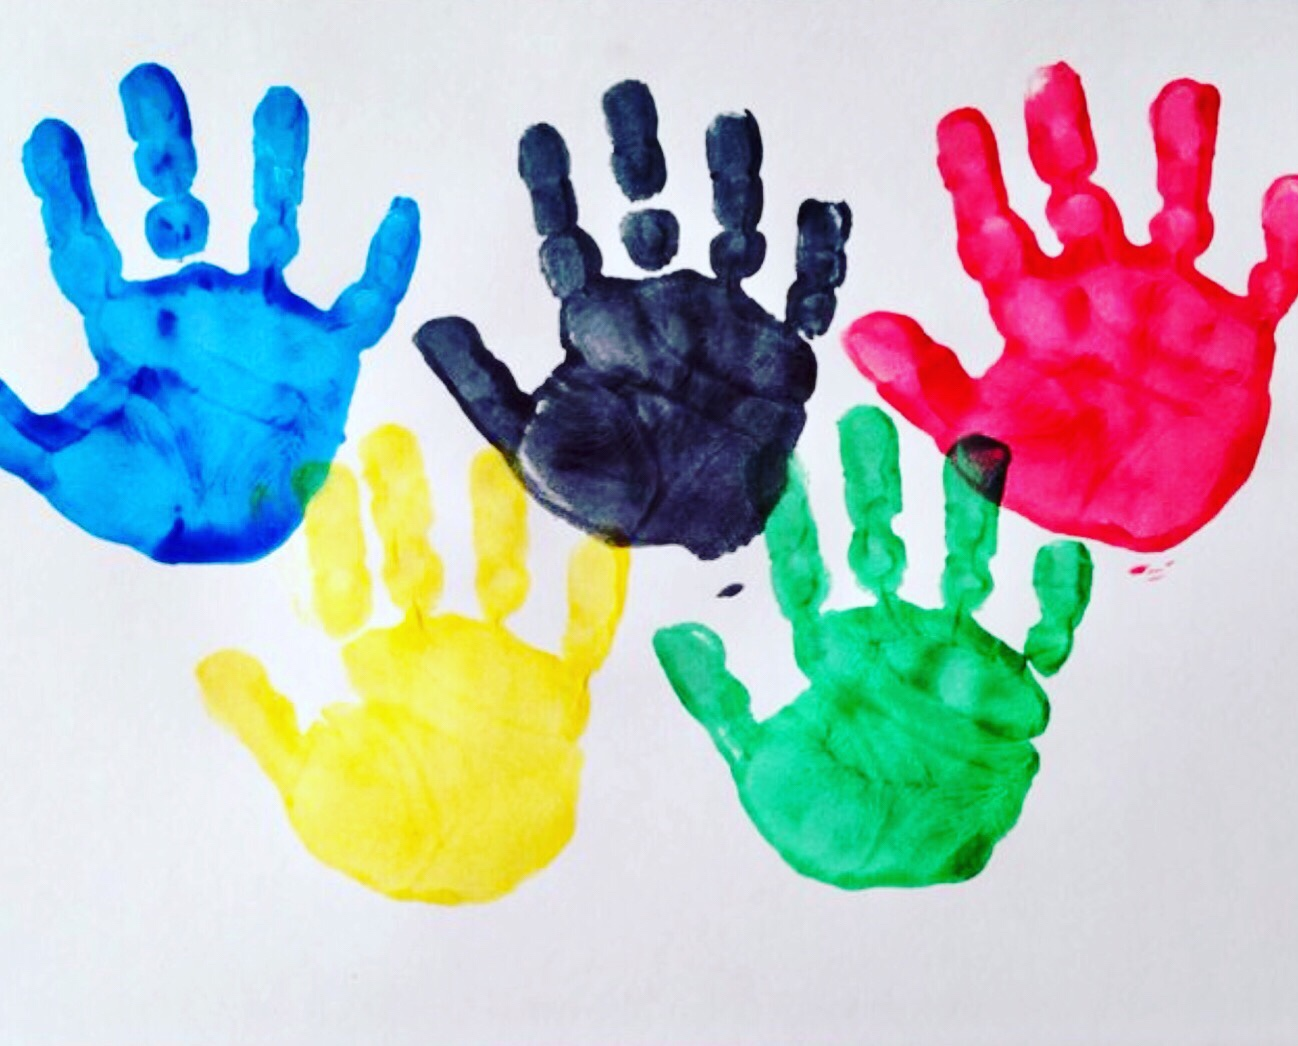 Olympic Rings handprint craft